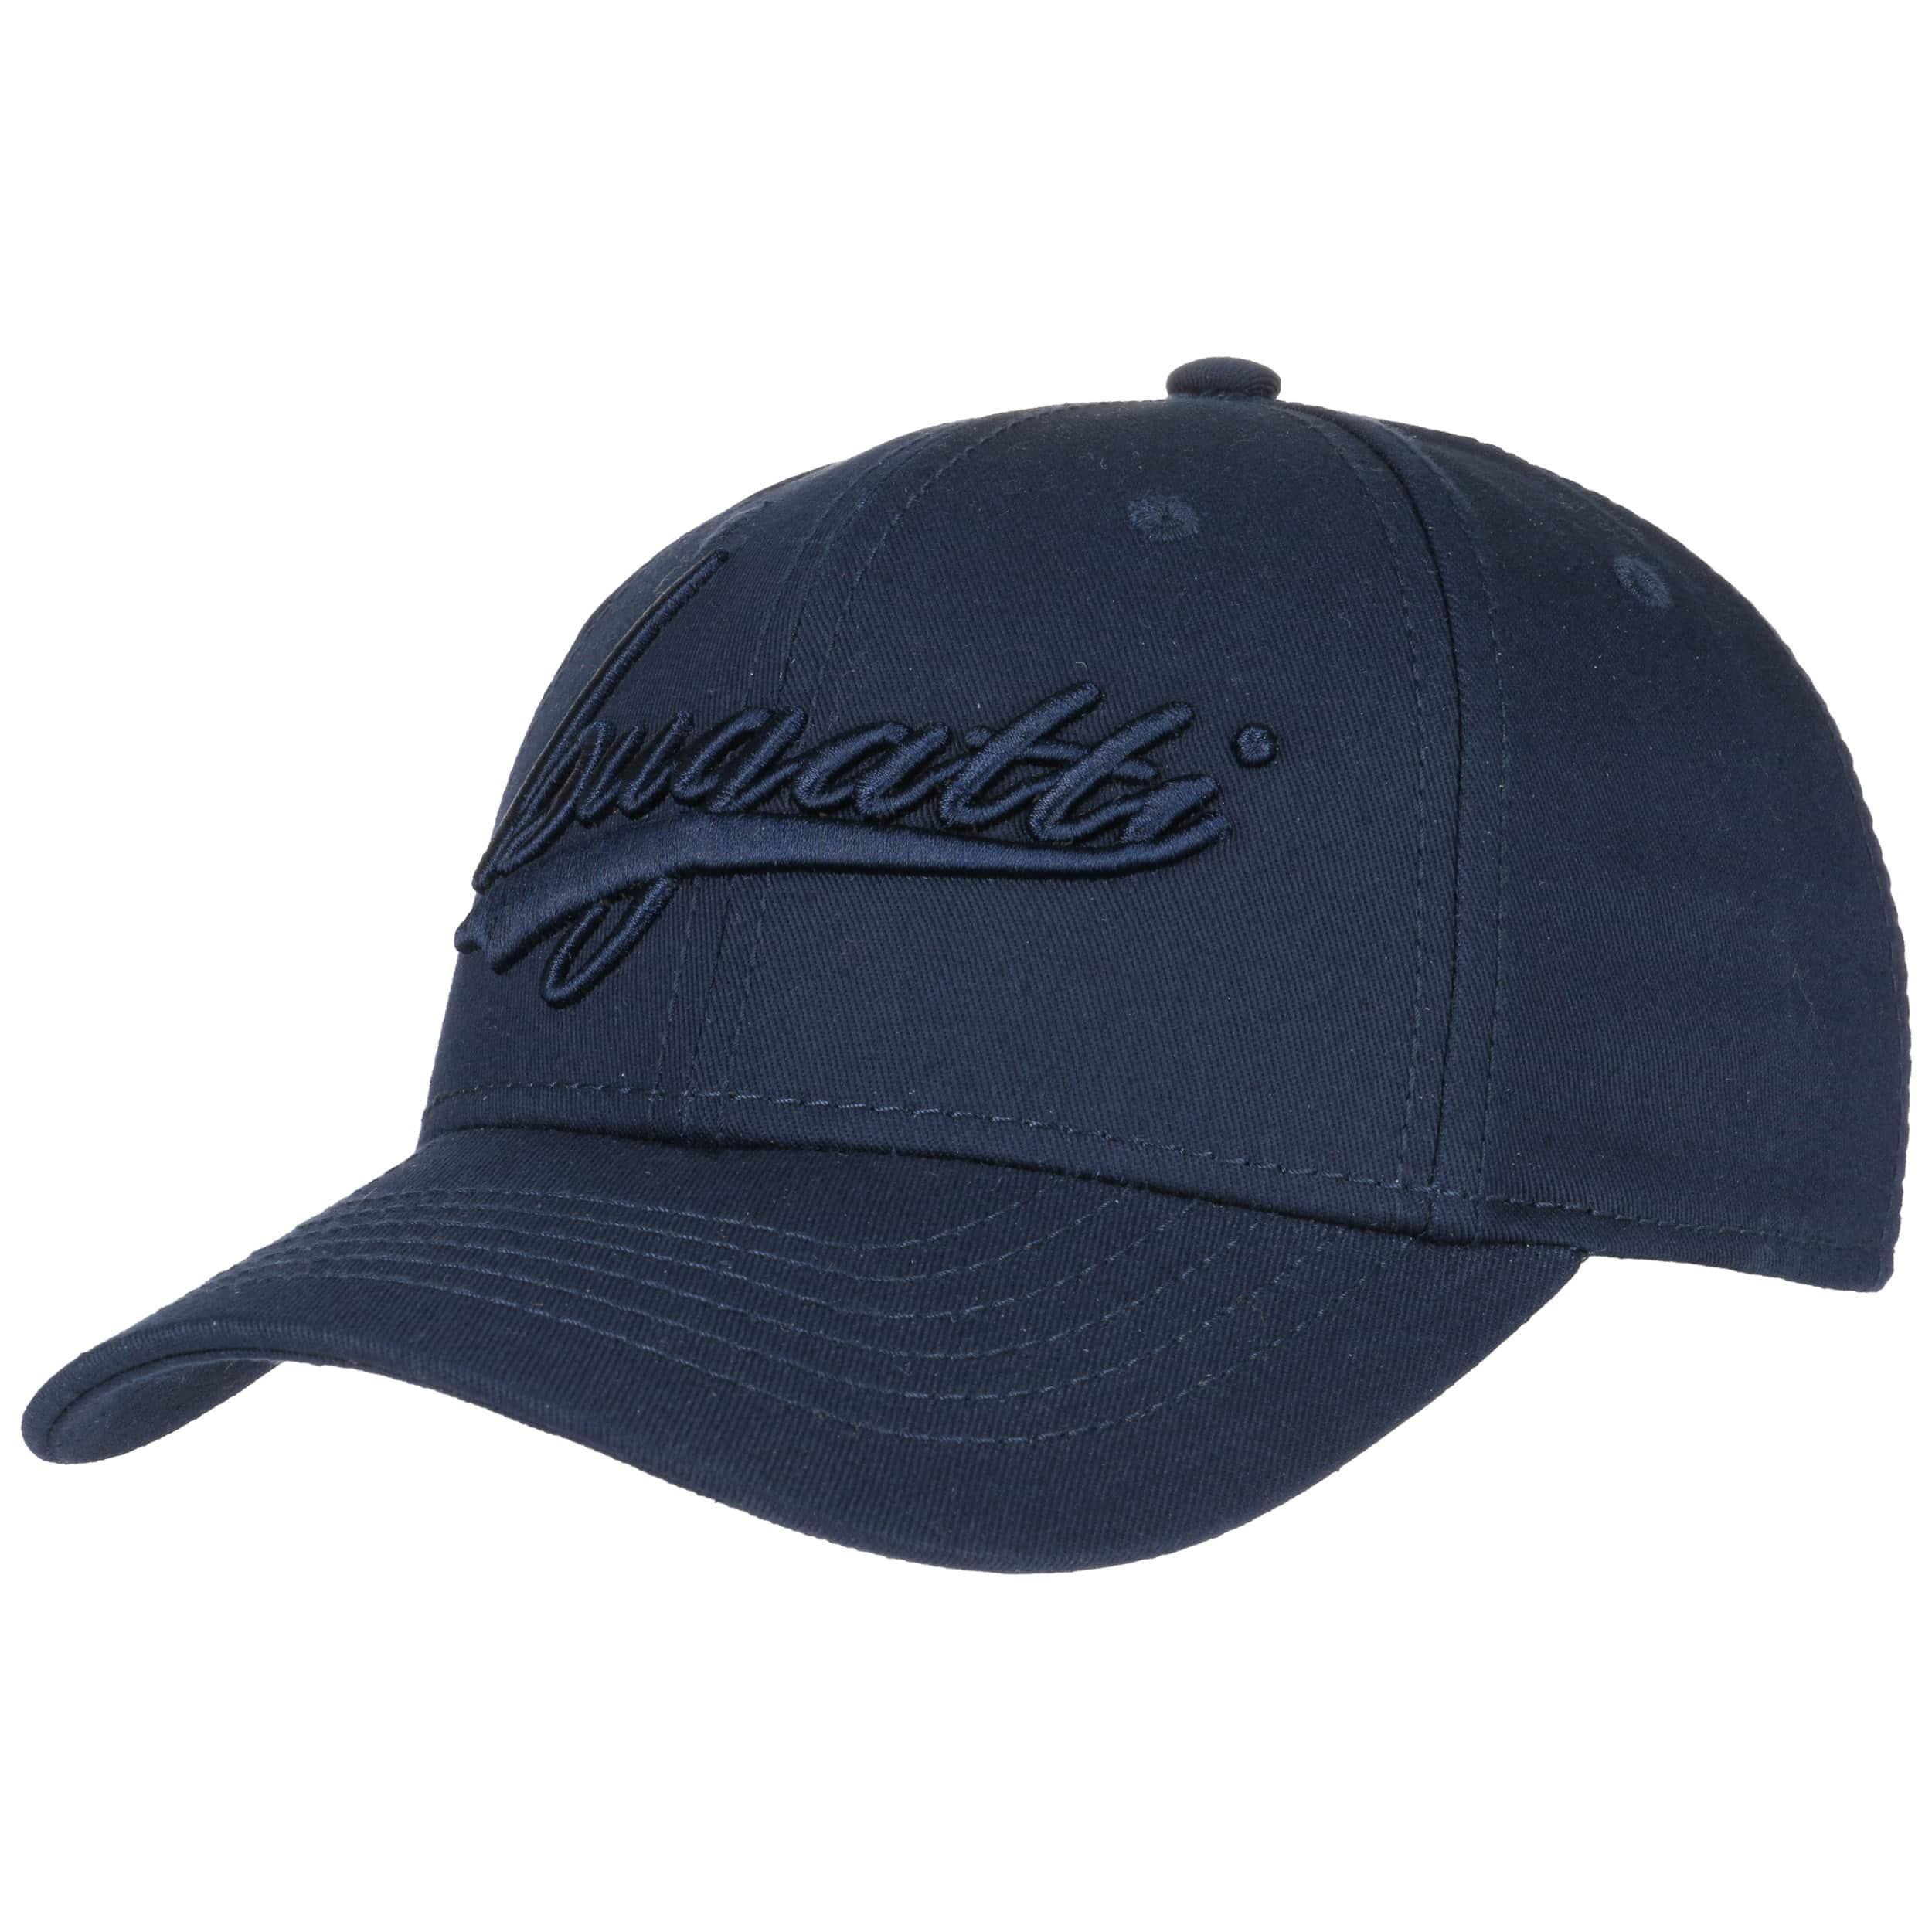 ... UV Guard Baseball Cap by bugatti - blue 5 ... 2584b7a21d8e